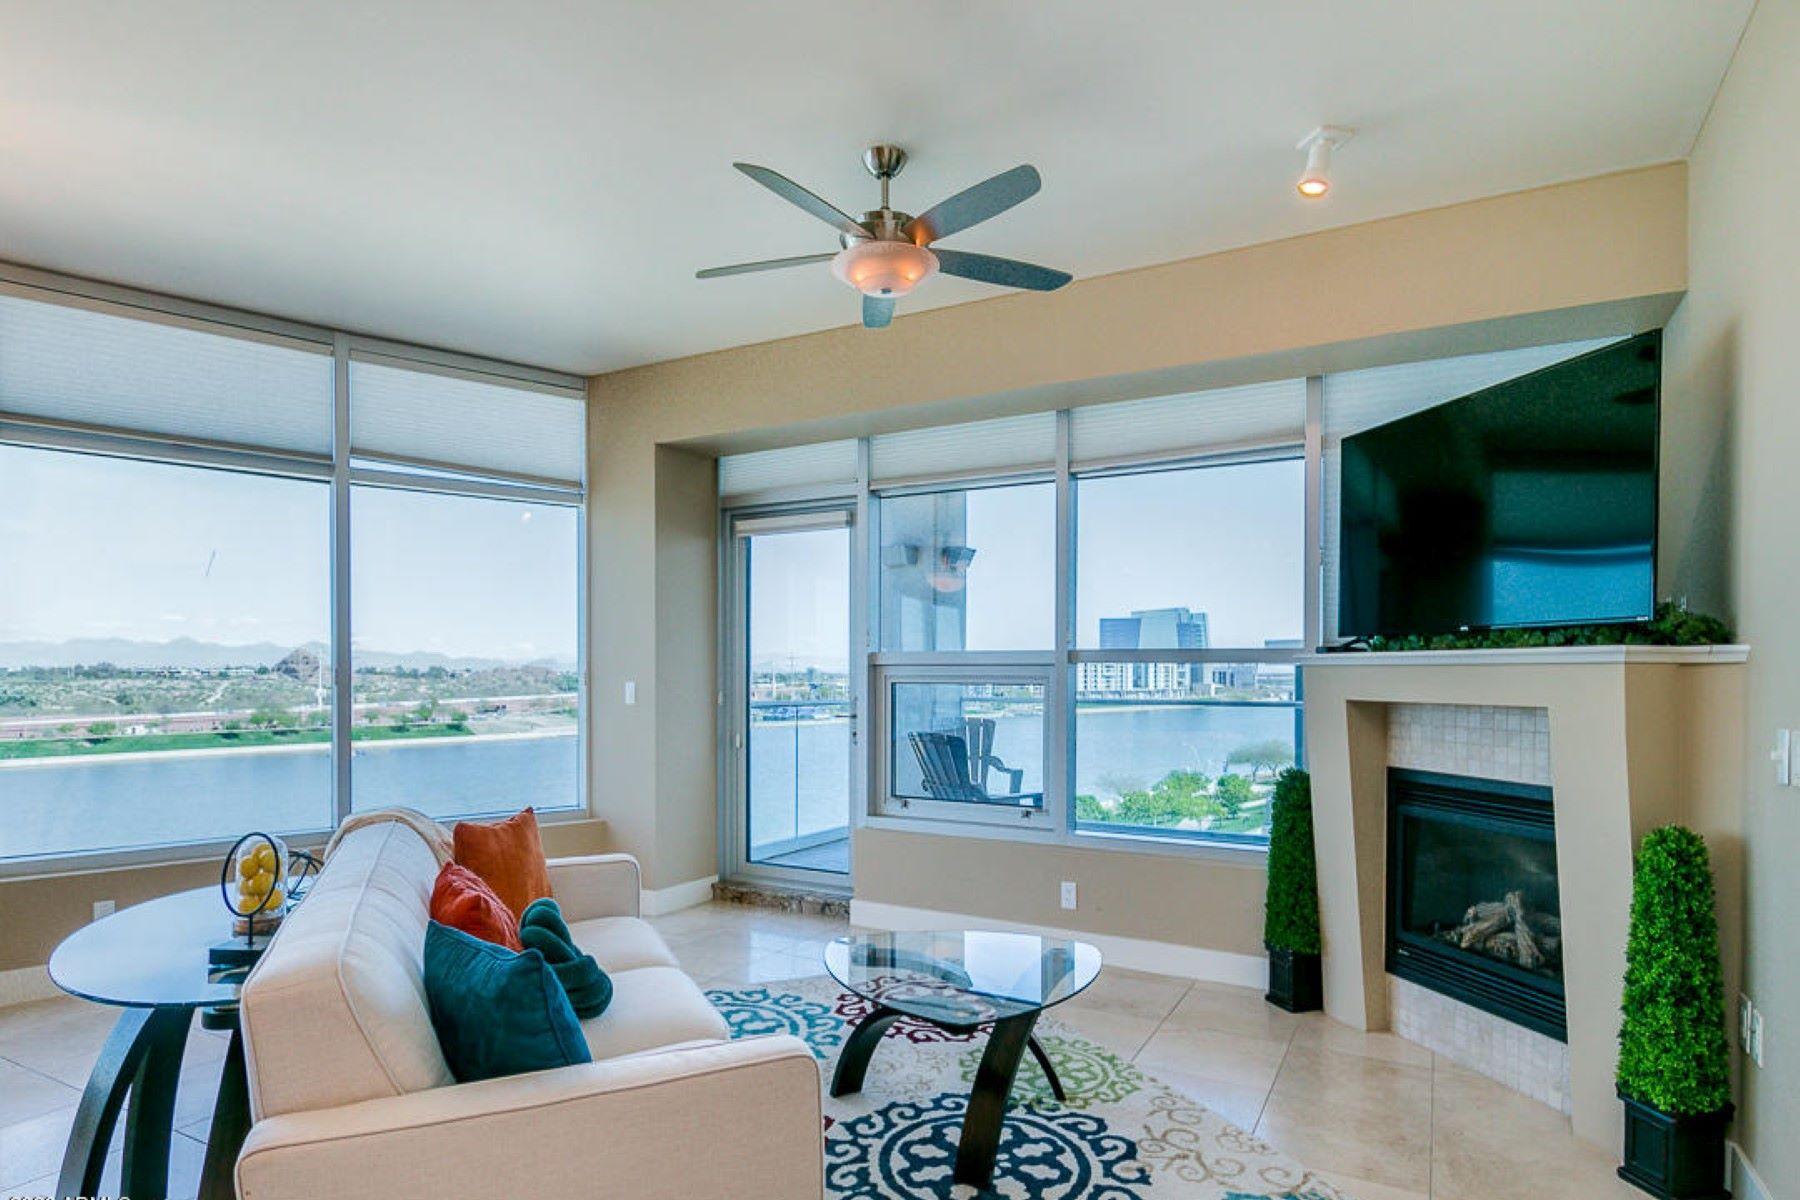 Apartments for Active at 140 RIO SALADO 507, Tempe, AZ 85281 140 RIO SALADO 507 Tempe, Arizona 85281 United States